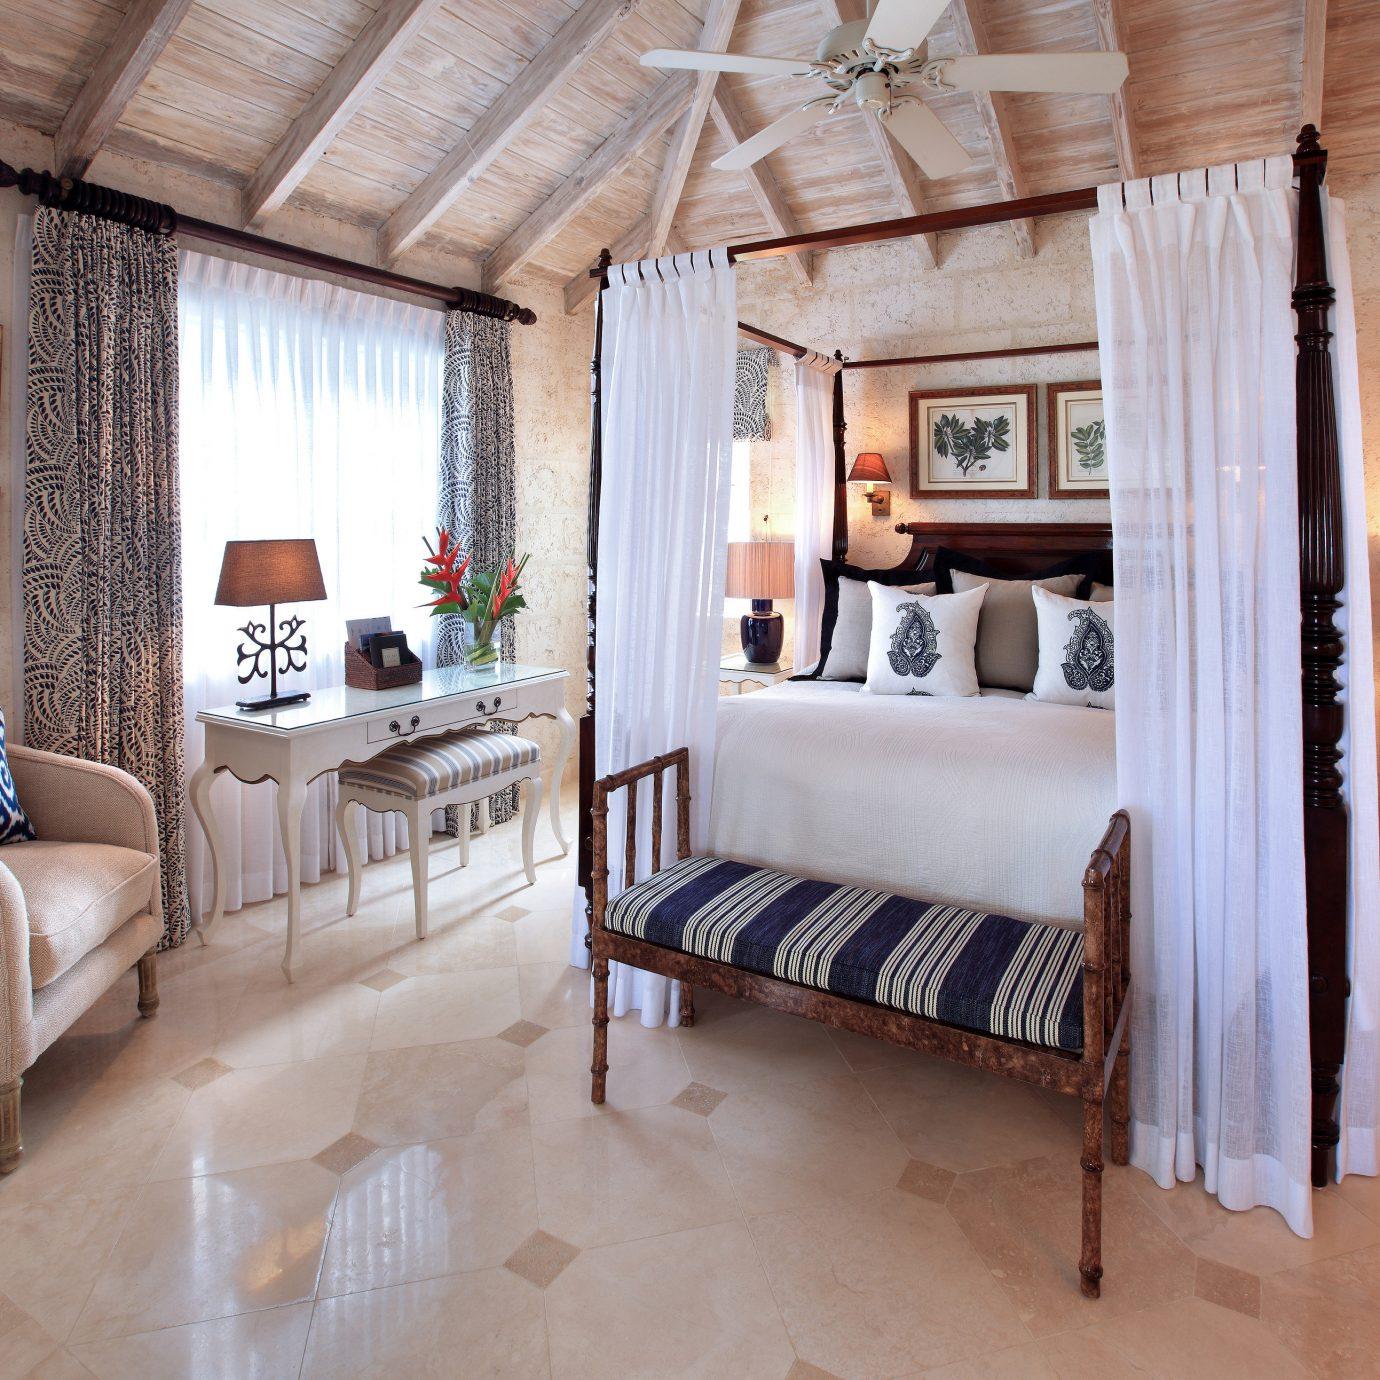 property living room home house cottage Bedroom farmhouse Villa loft mansion Suite